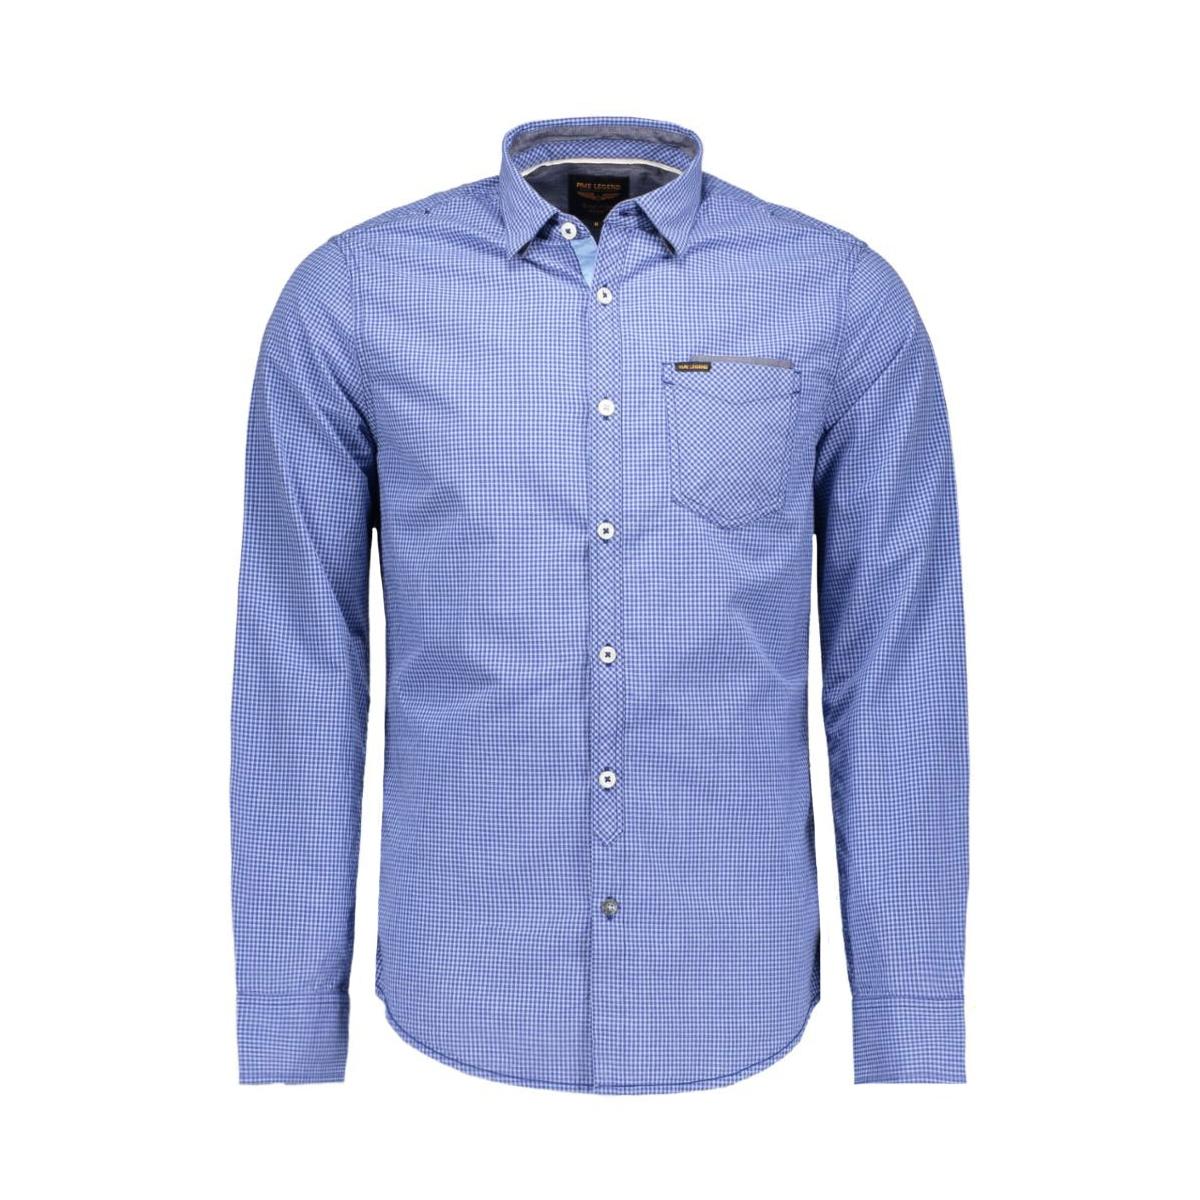 psi65212 pme legend overhemd 5507